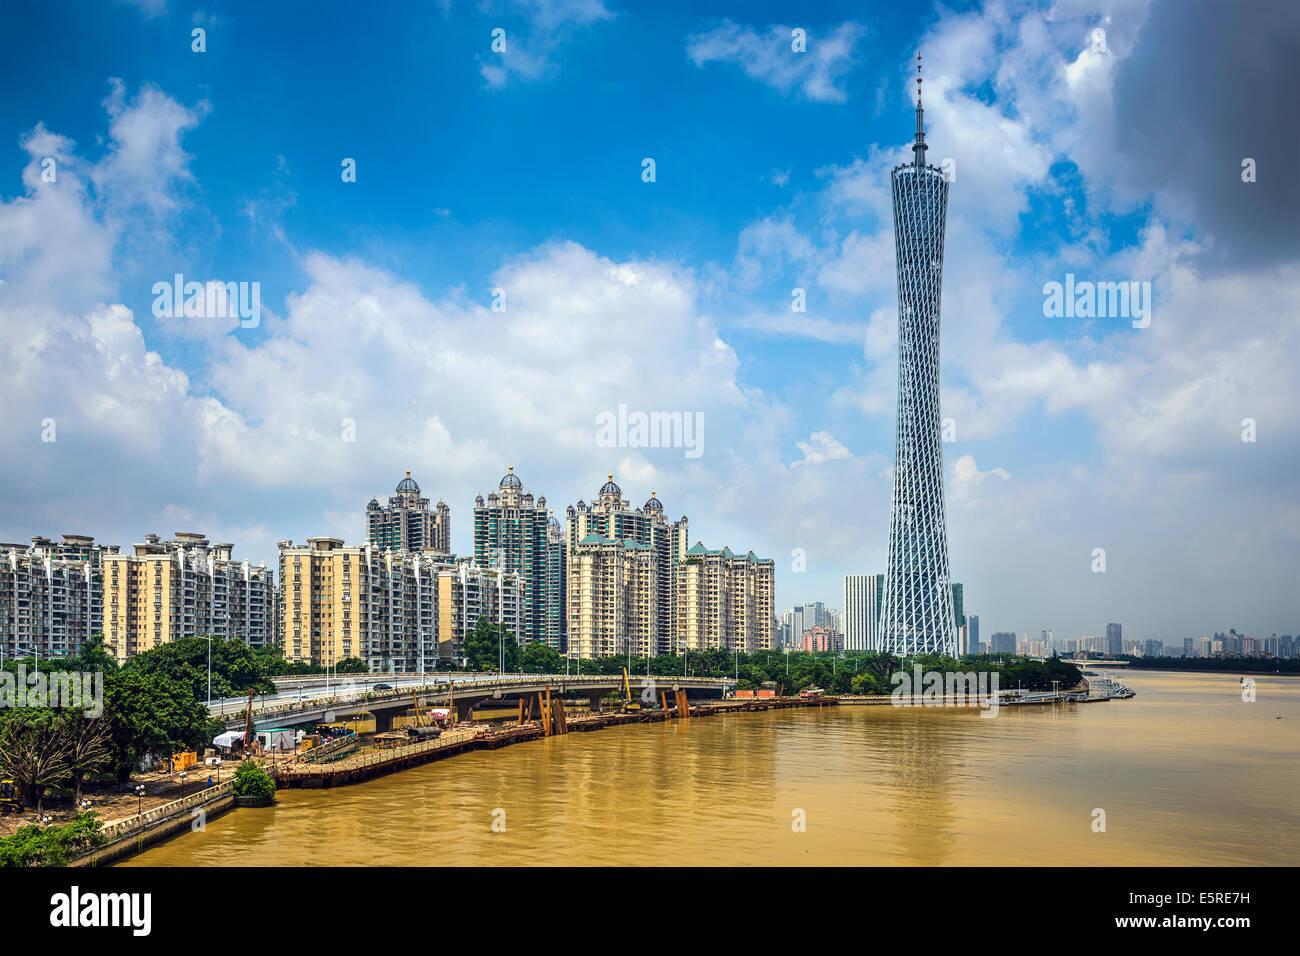 Guangzhou, China city skyline. - Stock Image